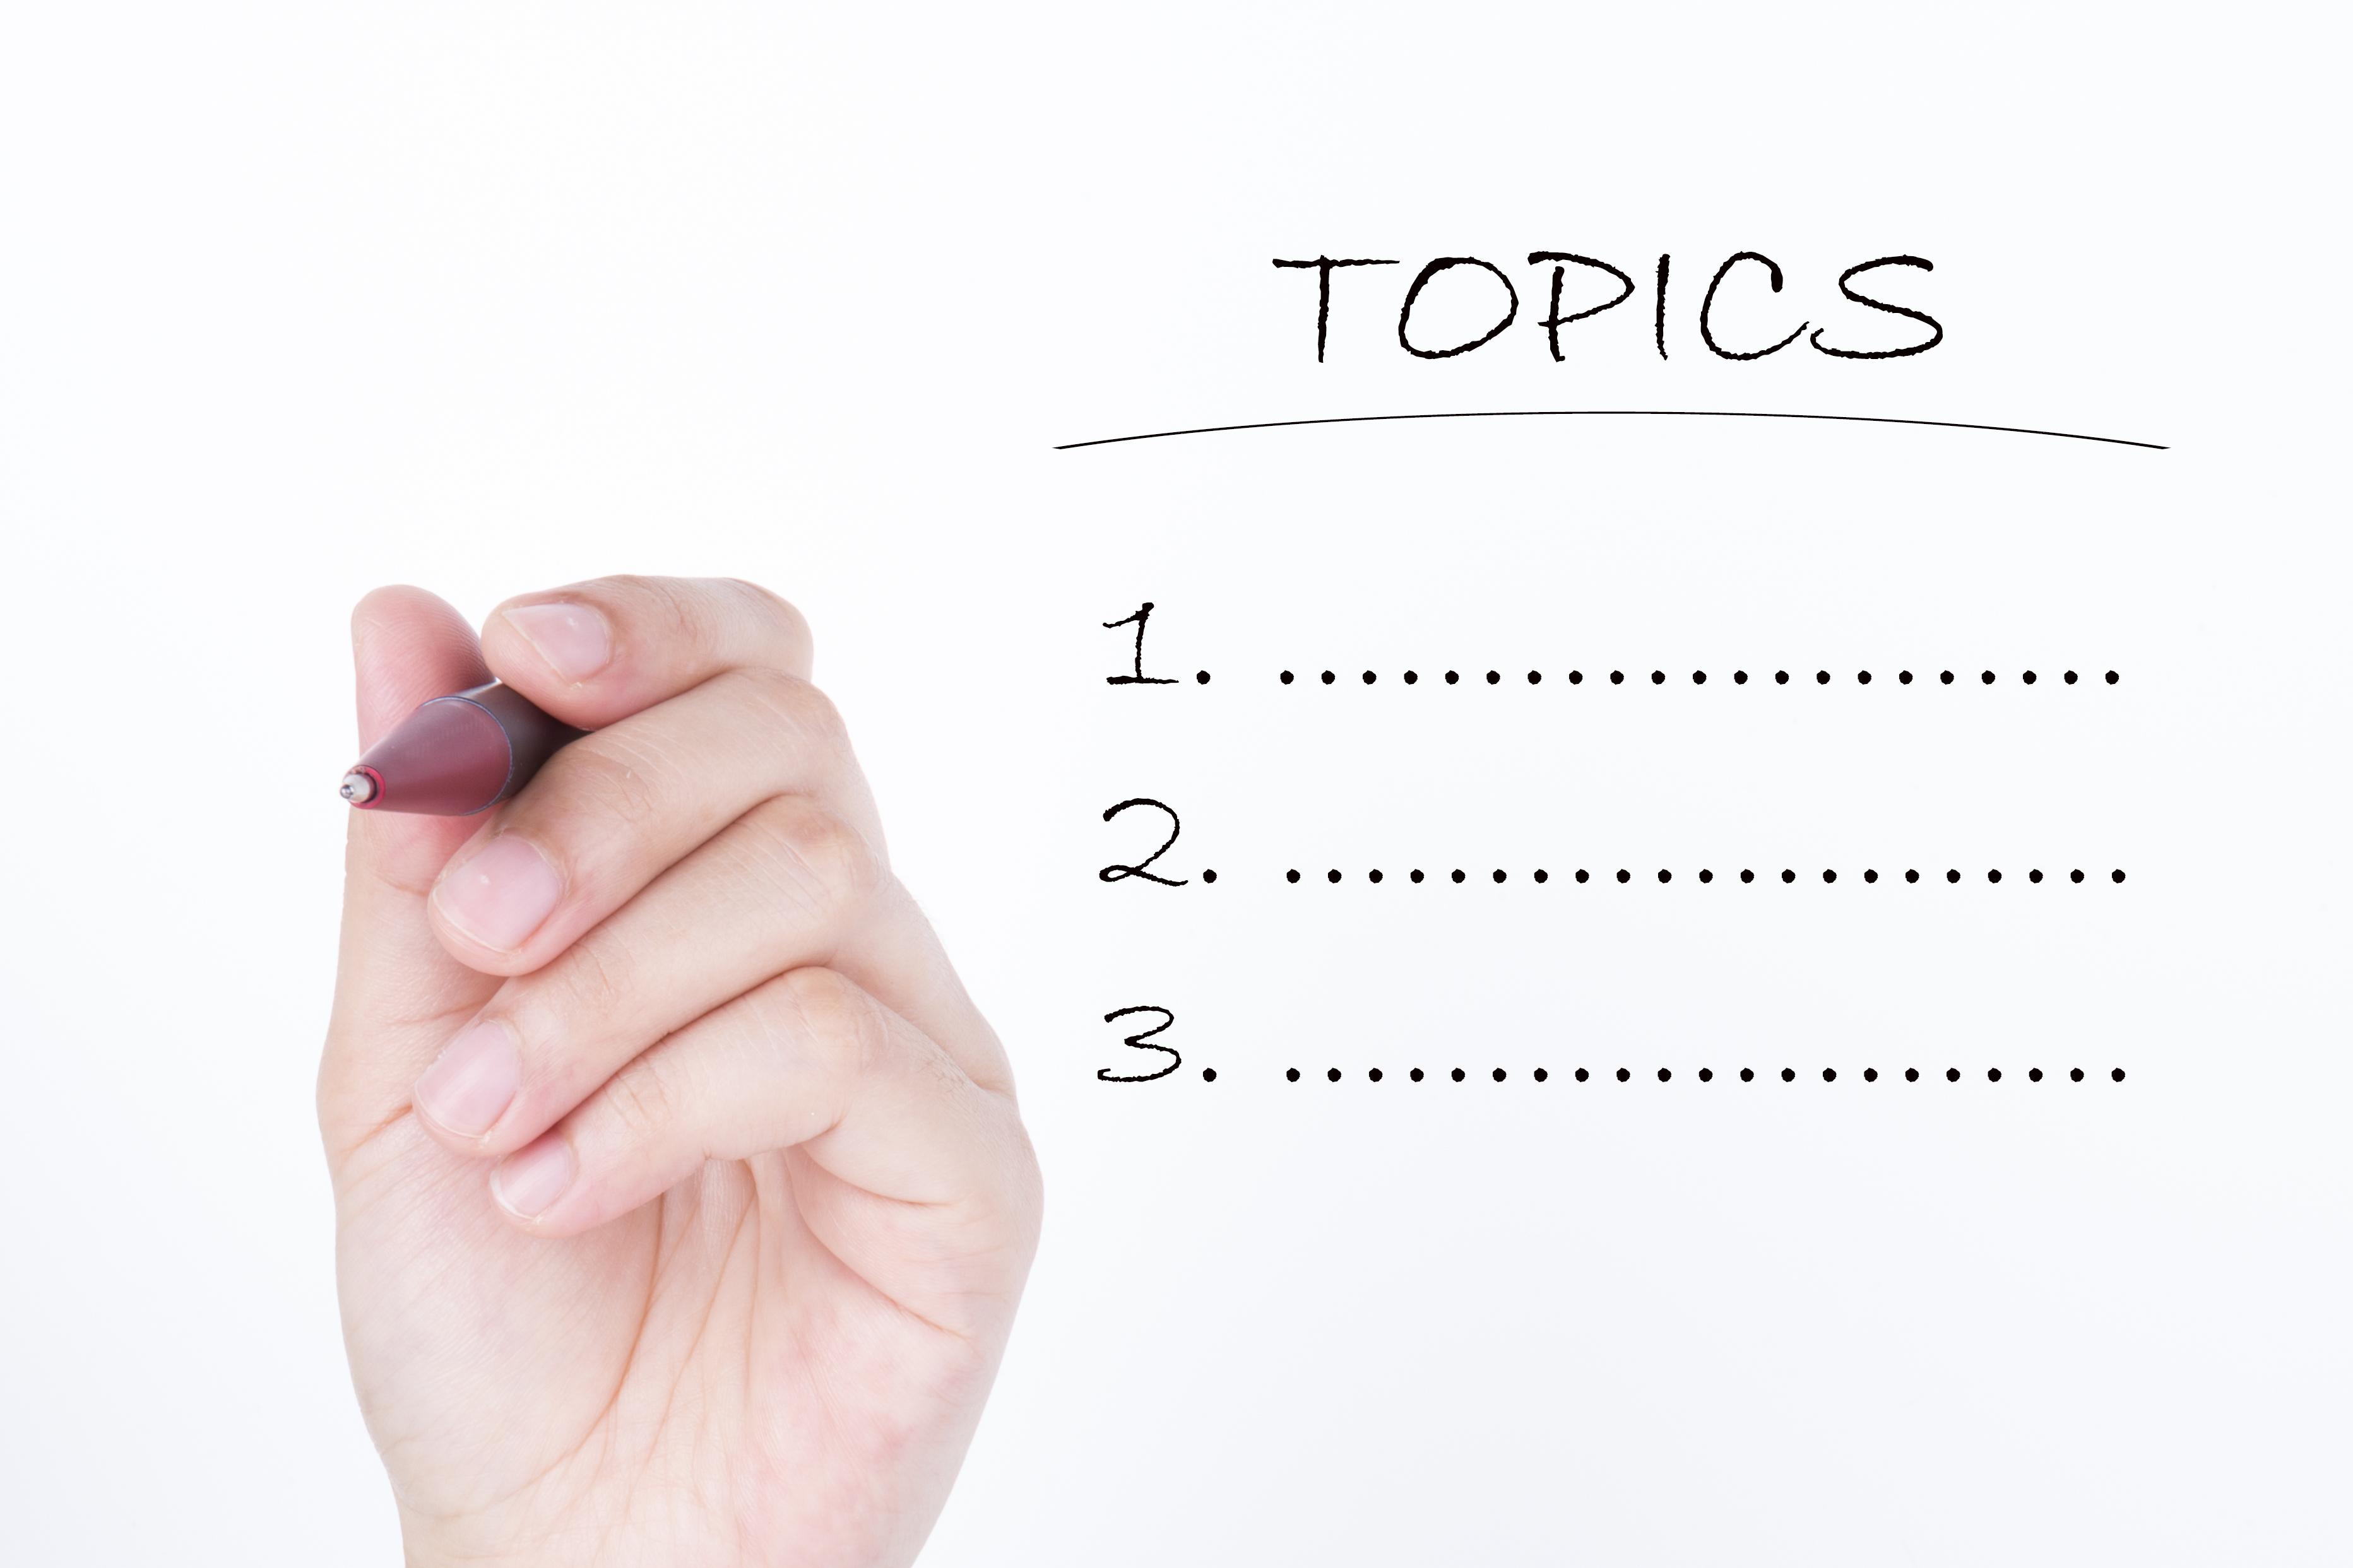 shutterstock-topics